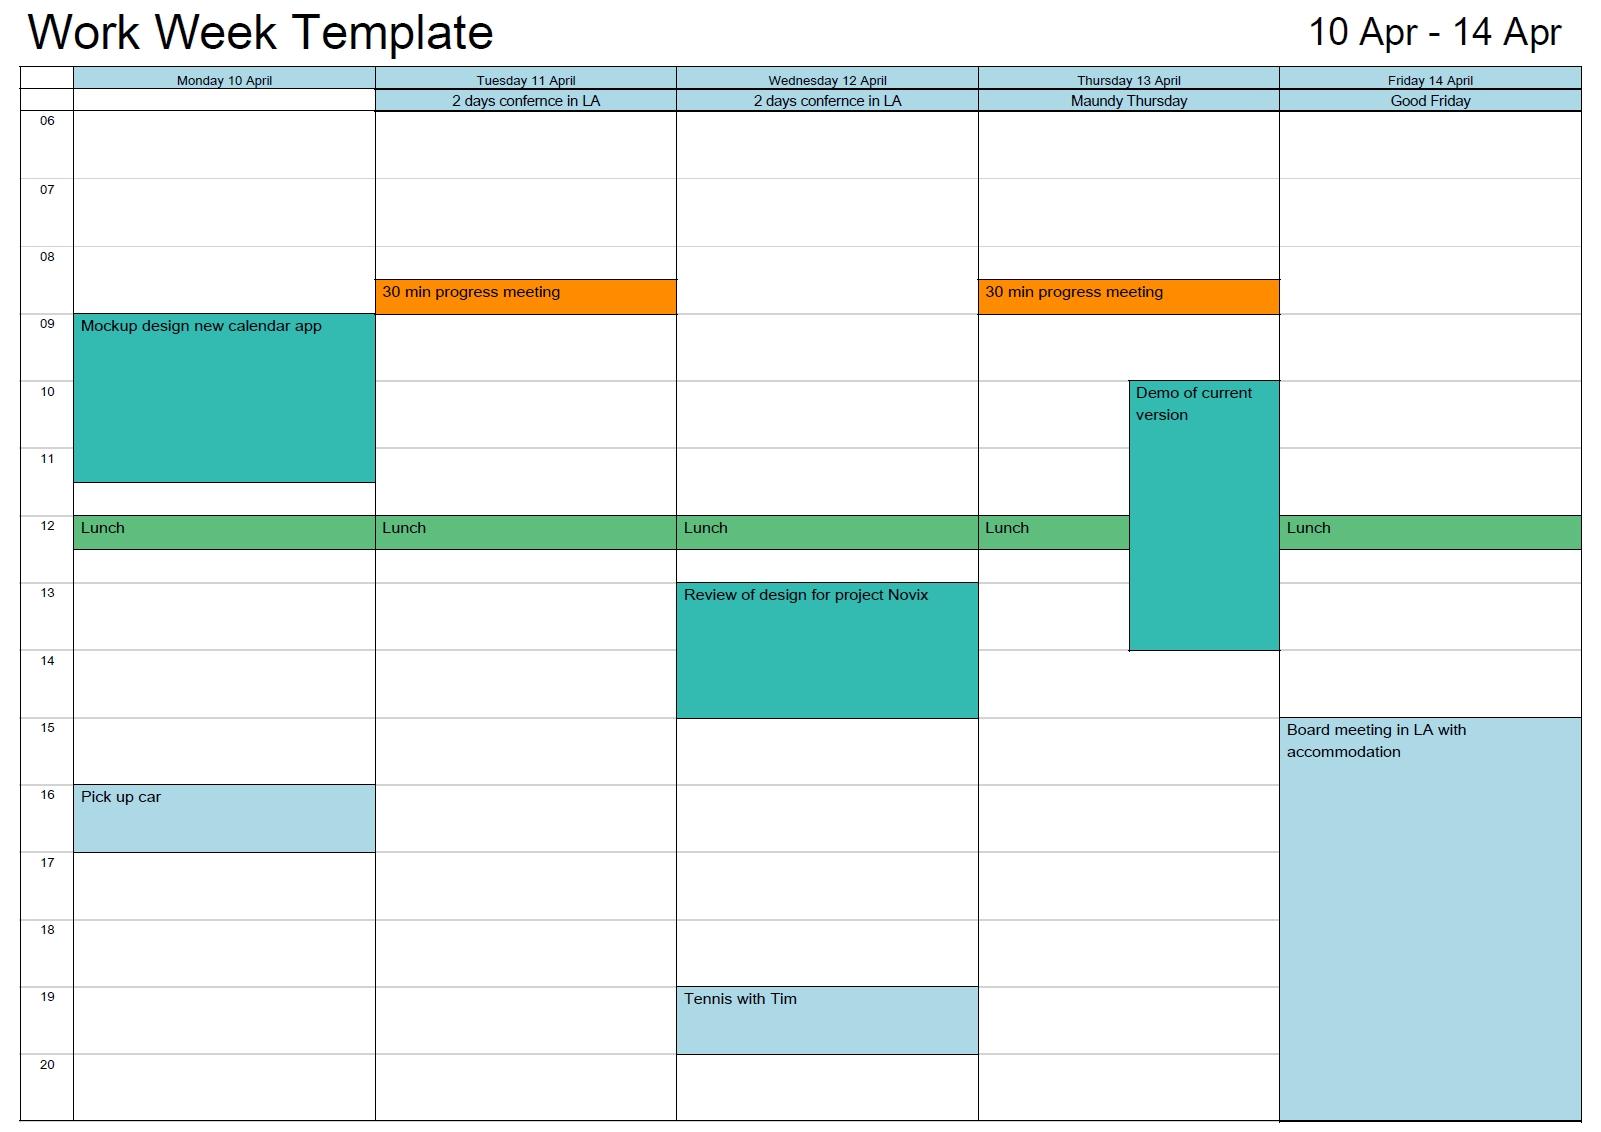 Outlook Calendar Print